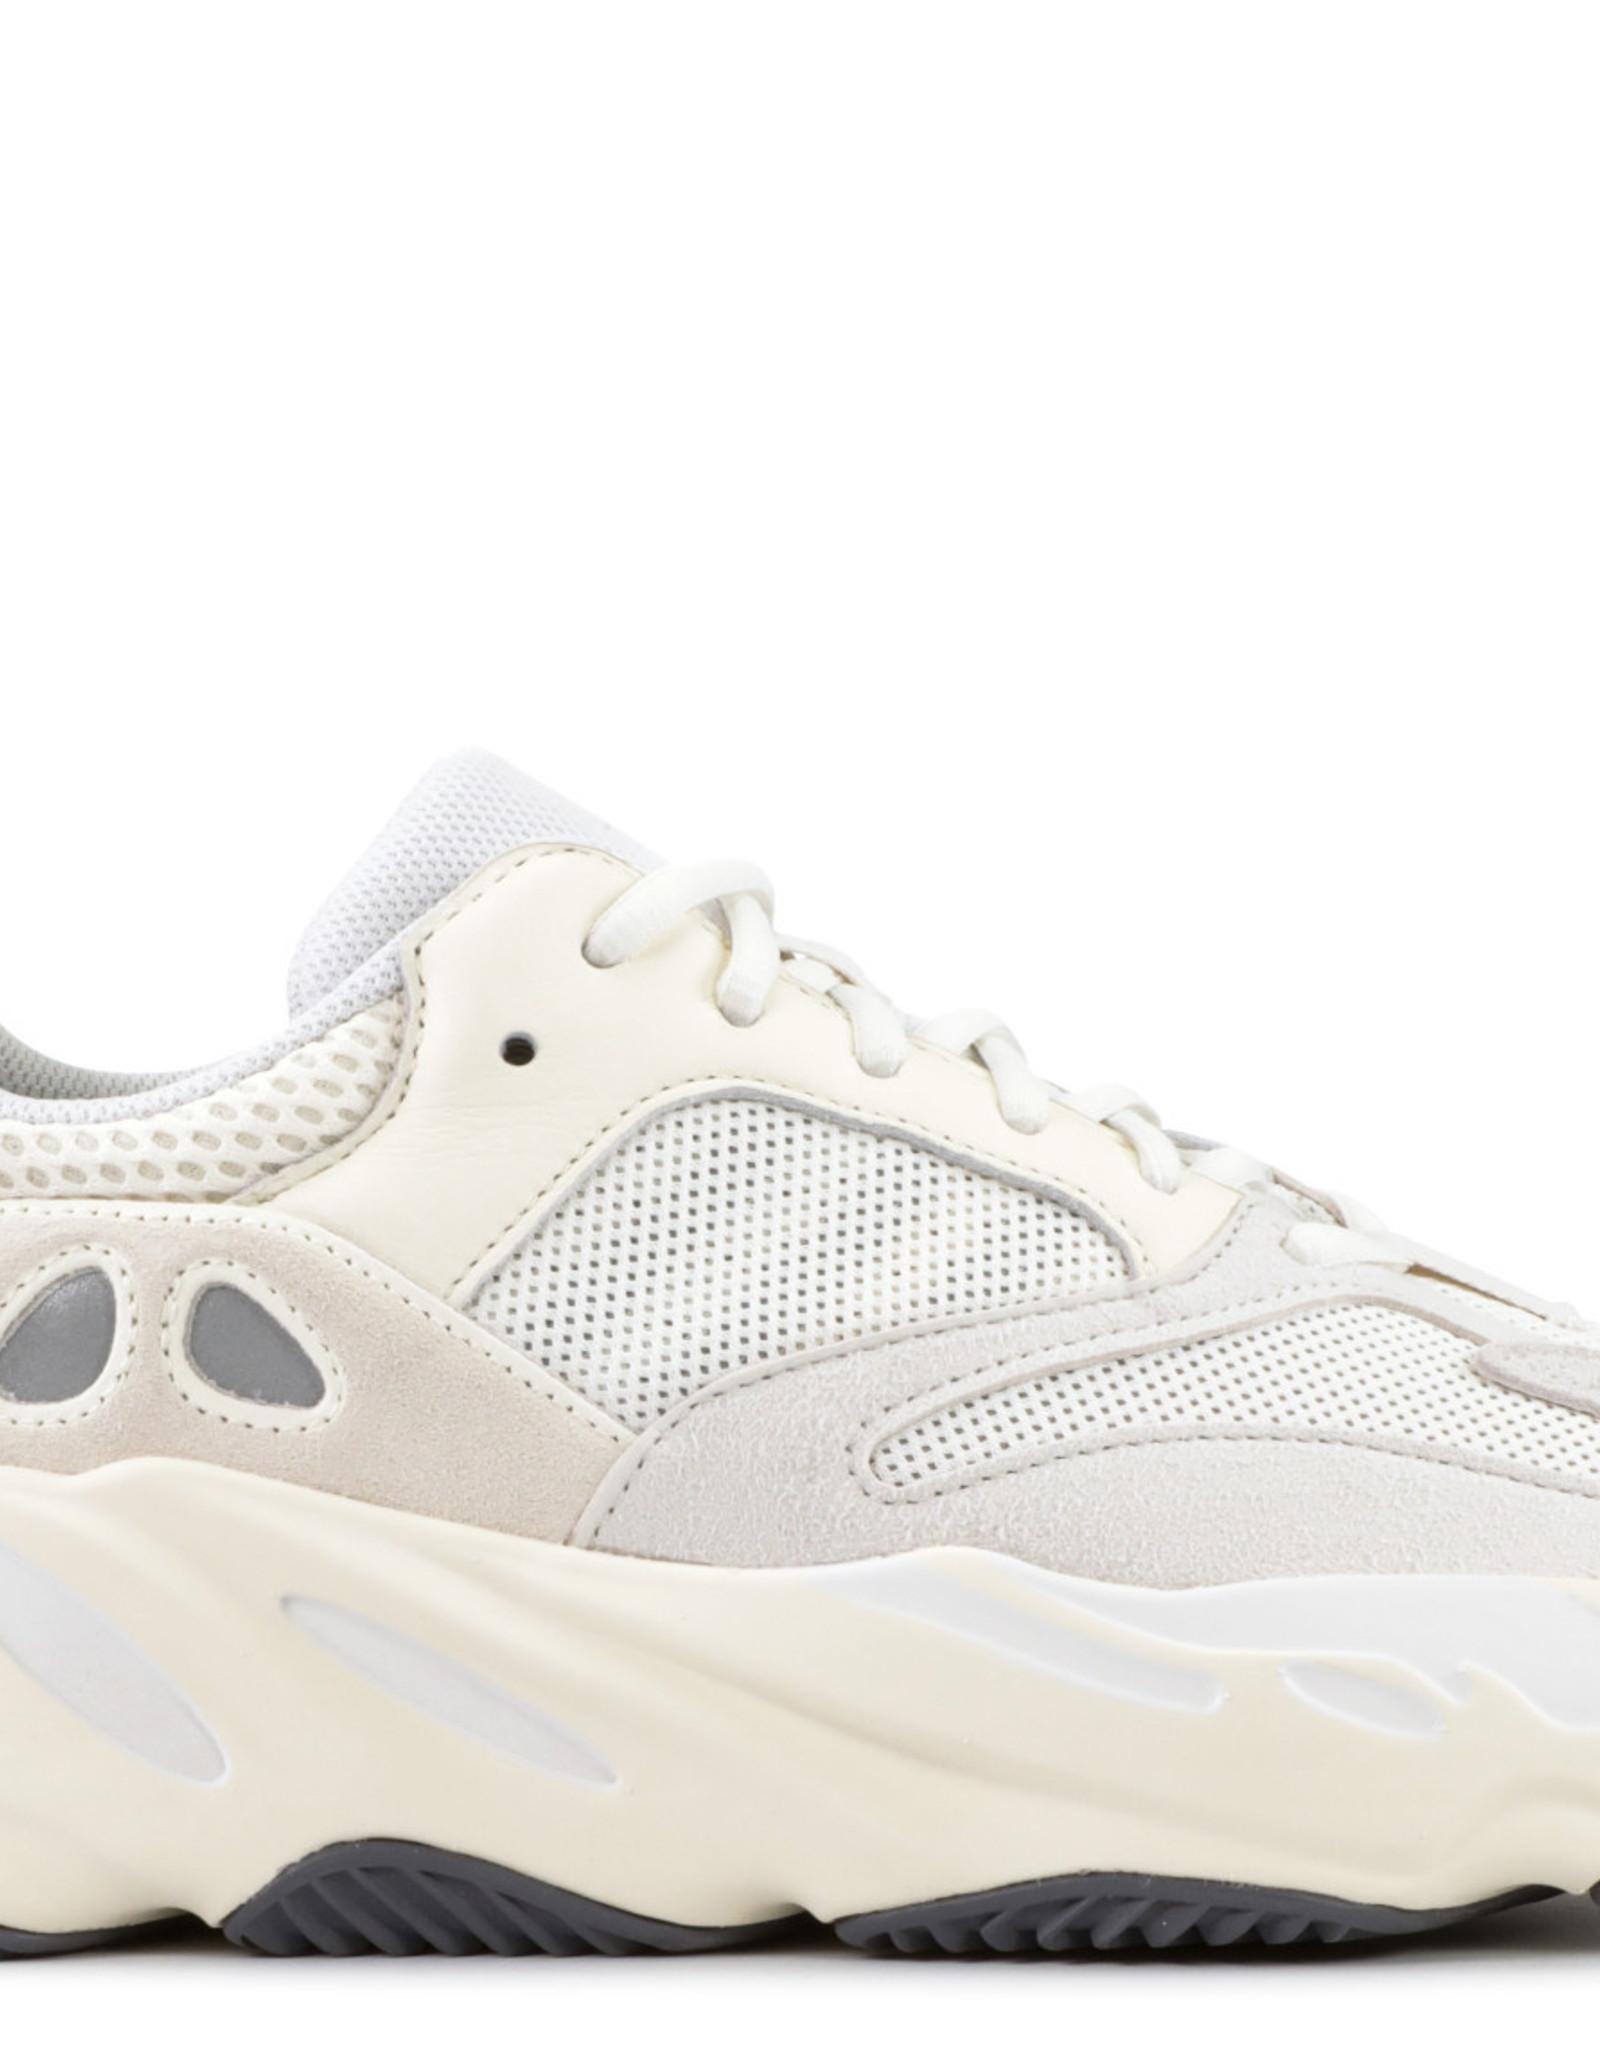 YEEZY Adidas  Boost 700 Analog